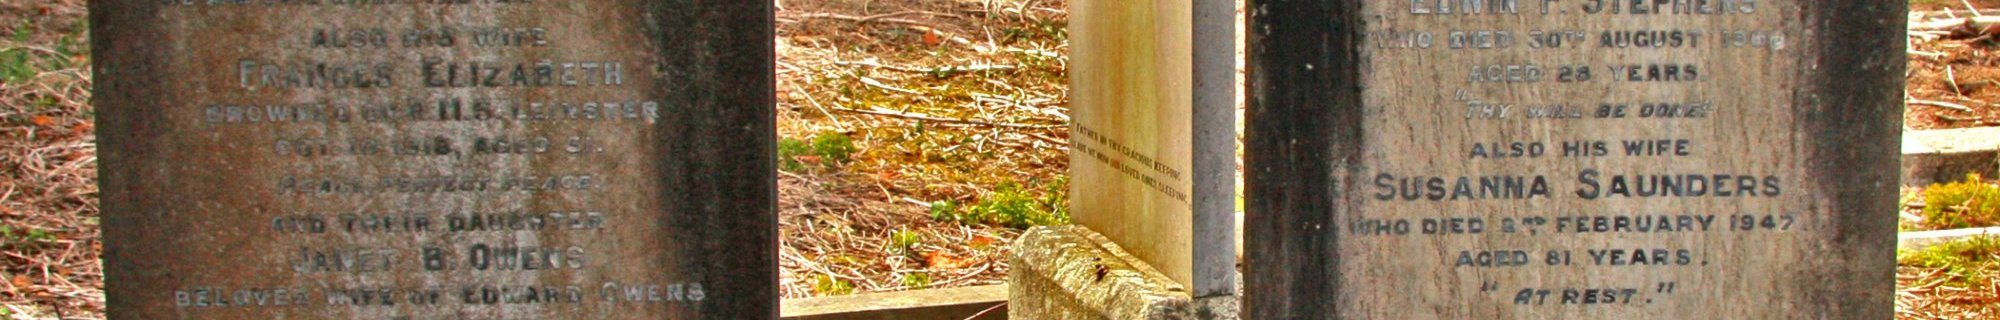 Deansgrange Cemetery Graves